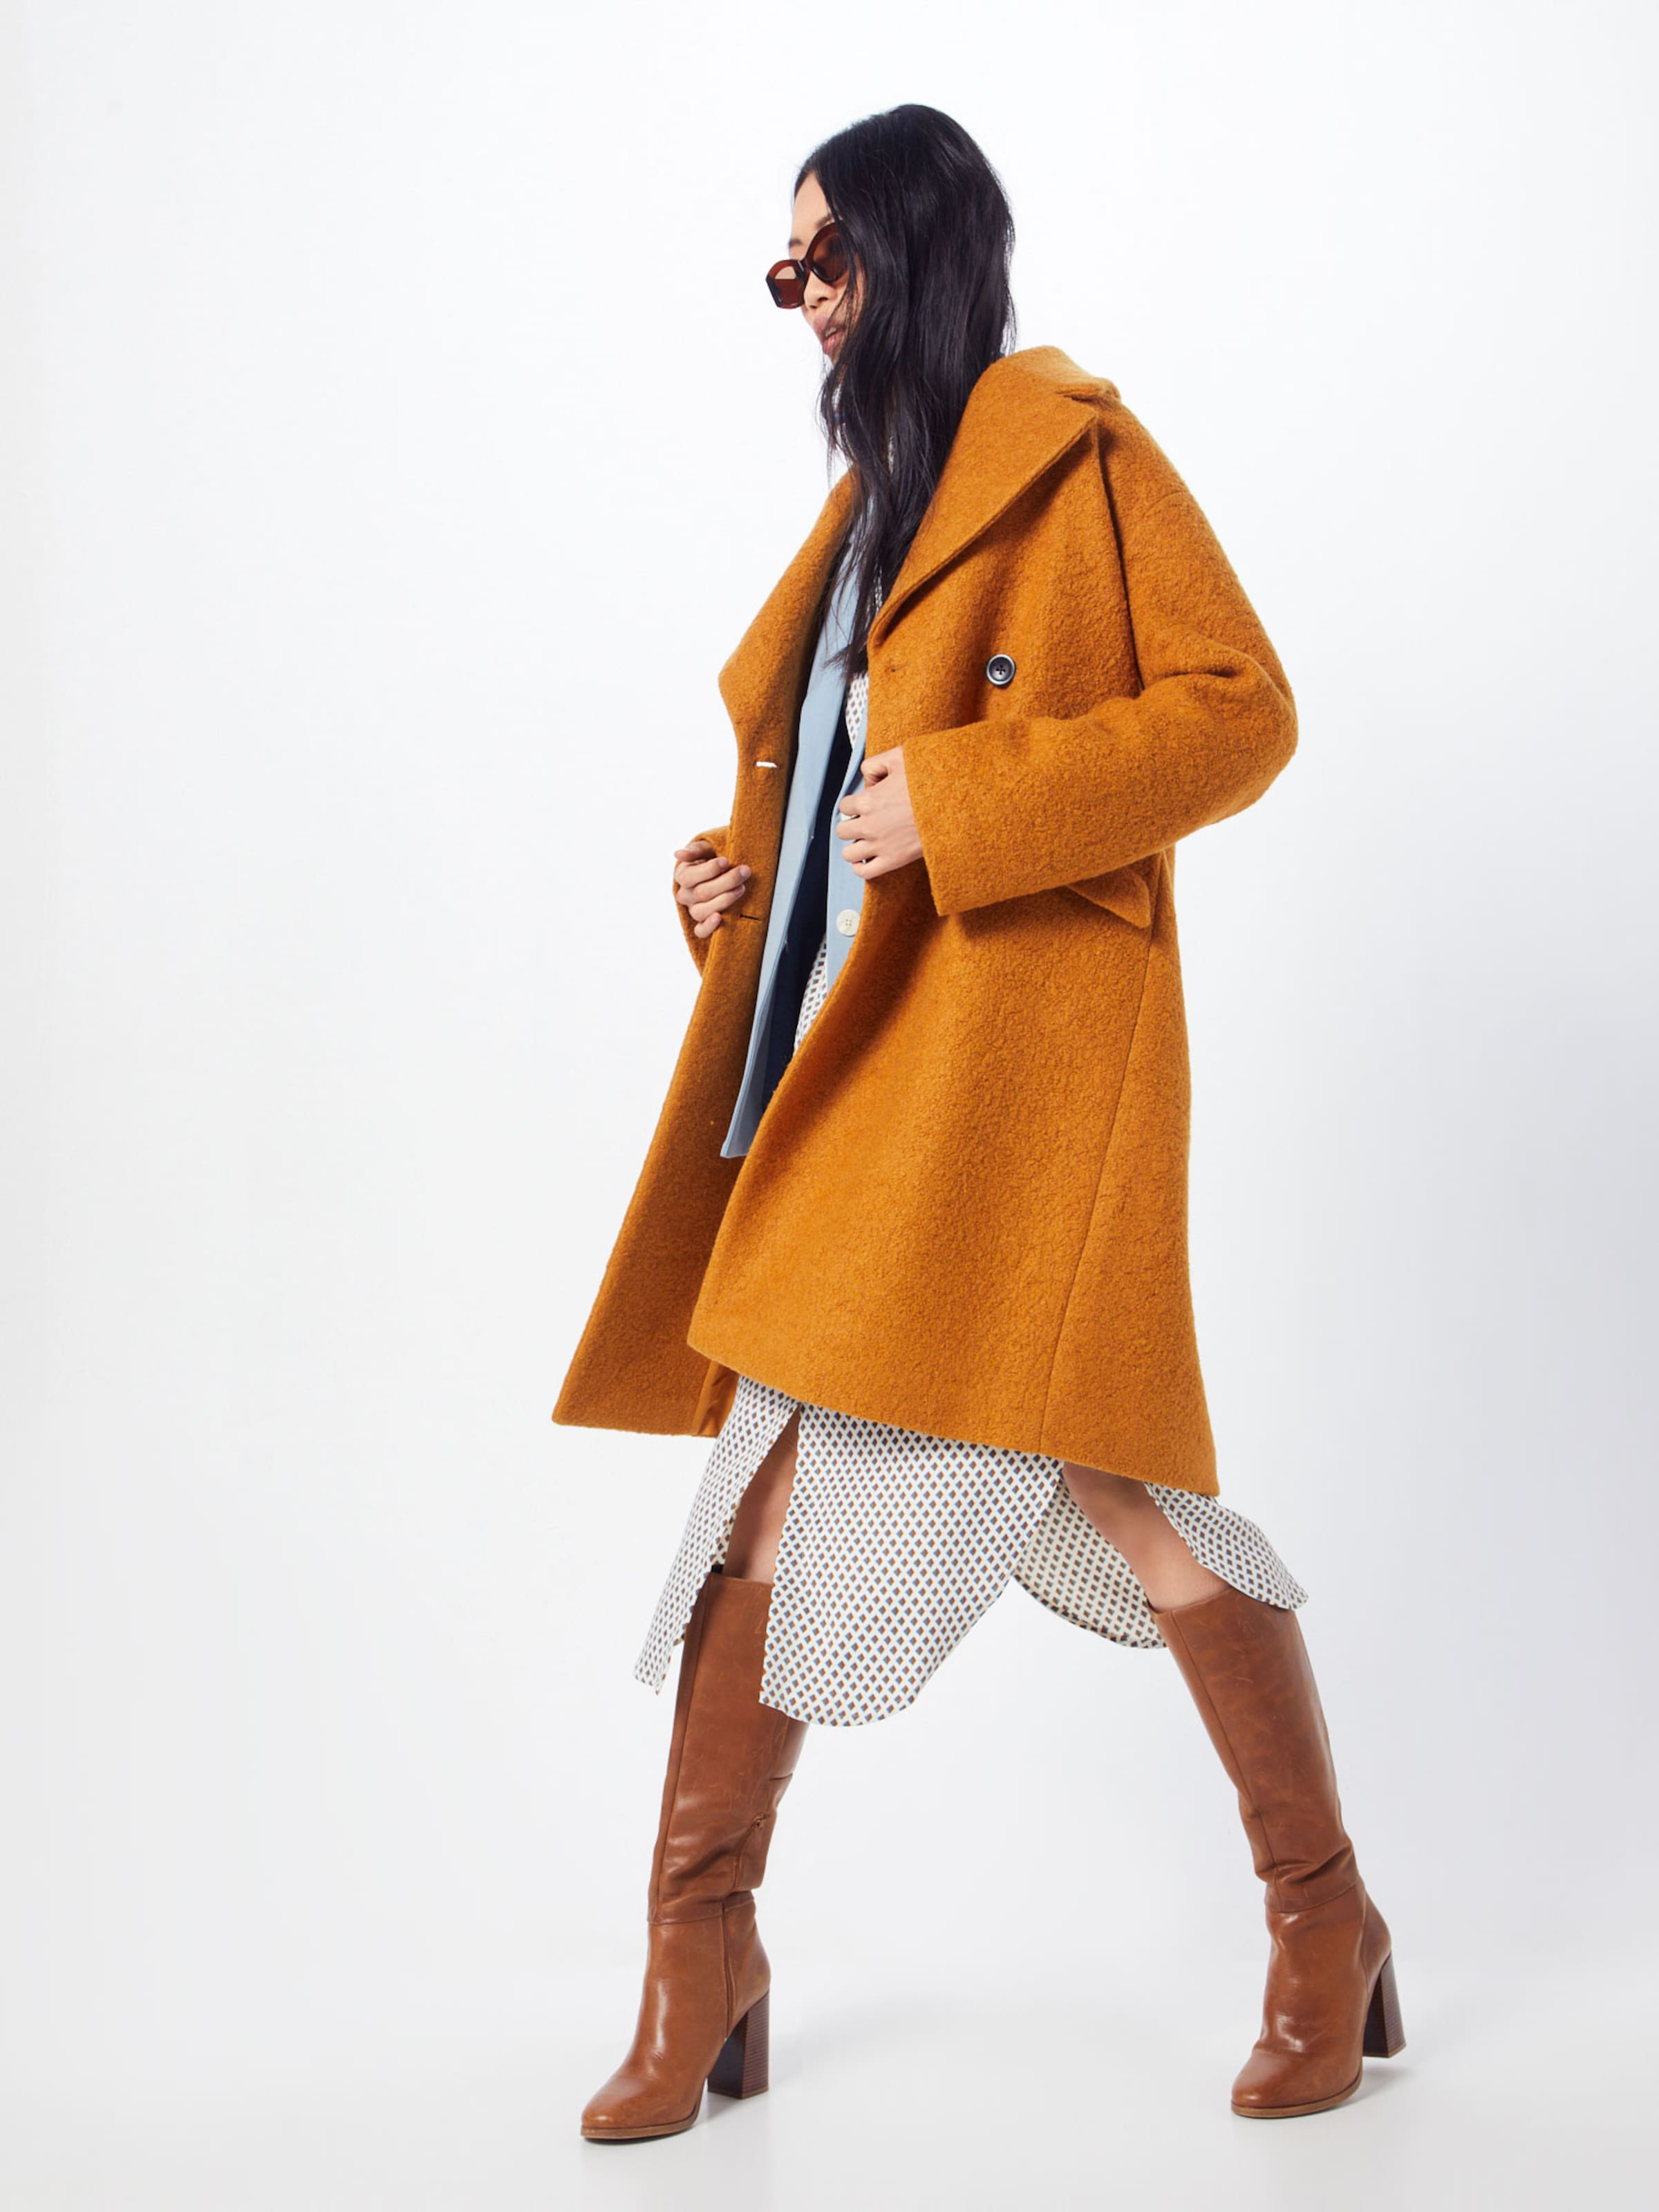 Dress Karma Moss Blanc En BleuMarron Robe Aop' chemise 'kimora Copenhagen fvIbgY7y6